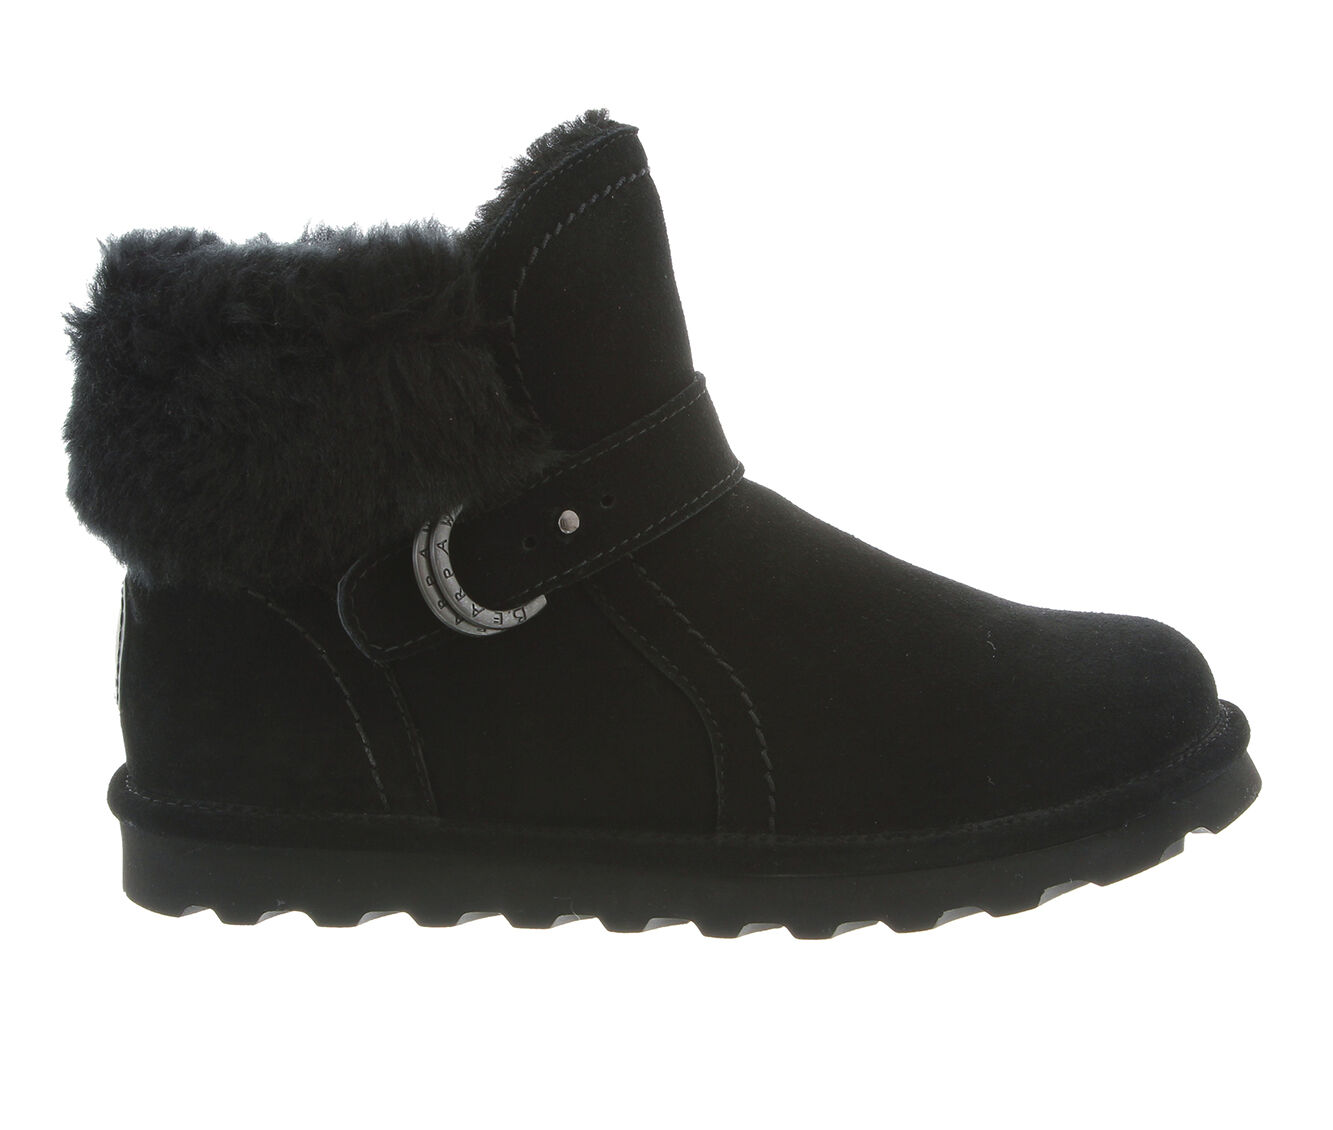 Women's Bearpaw Koko Boots Black